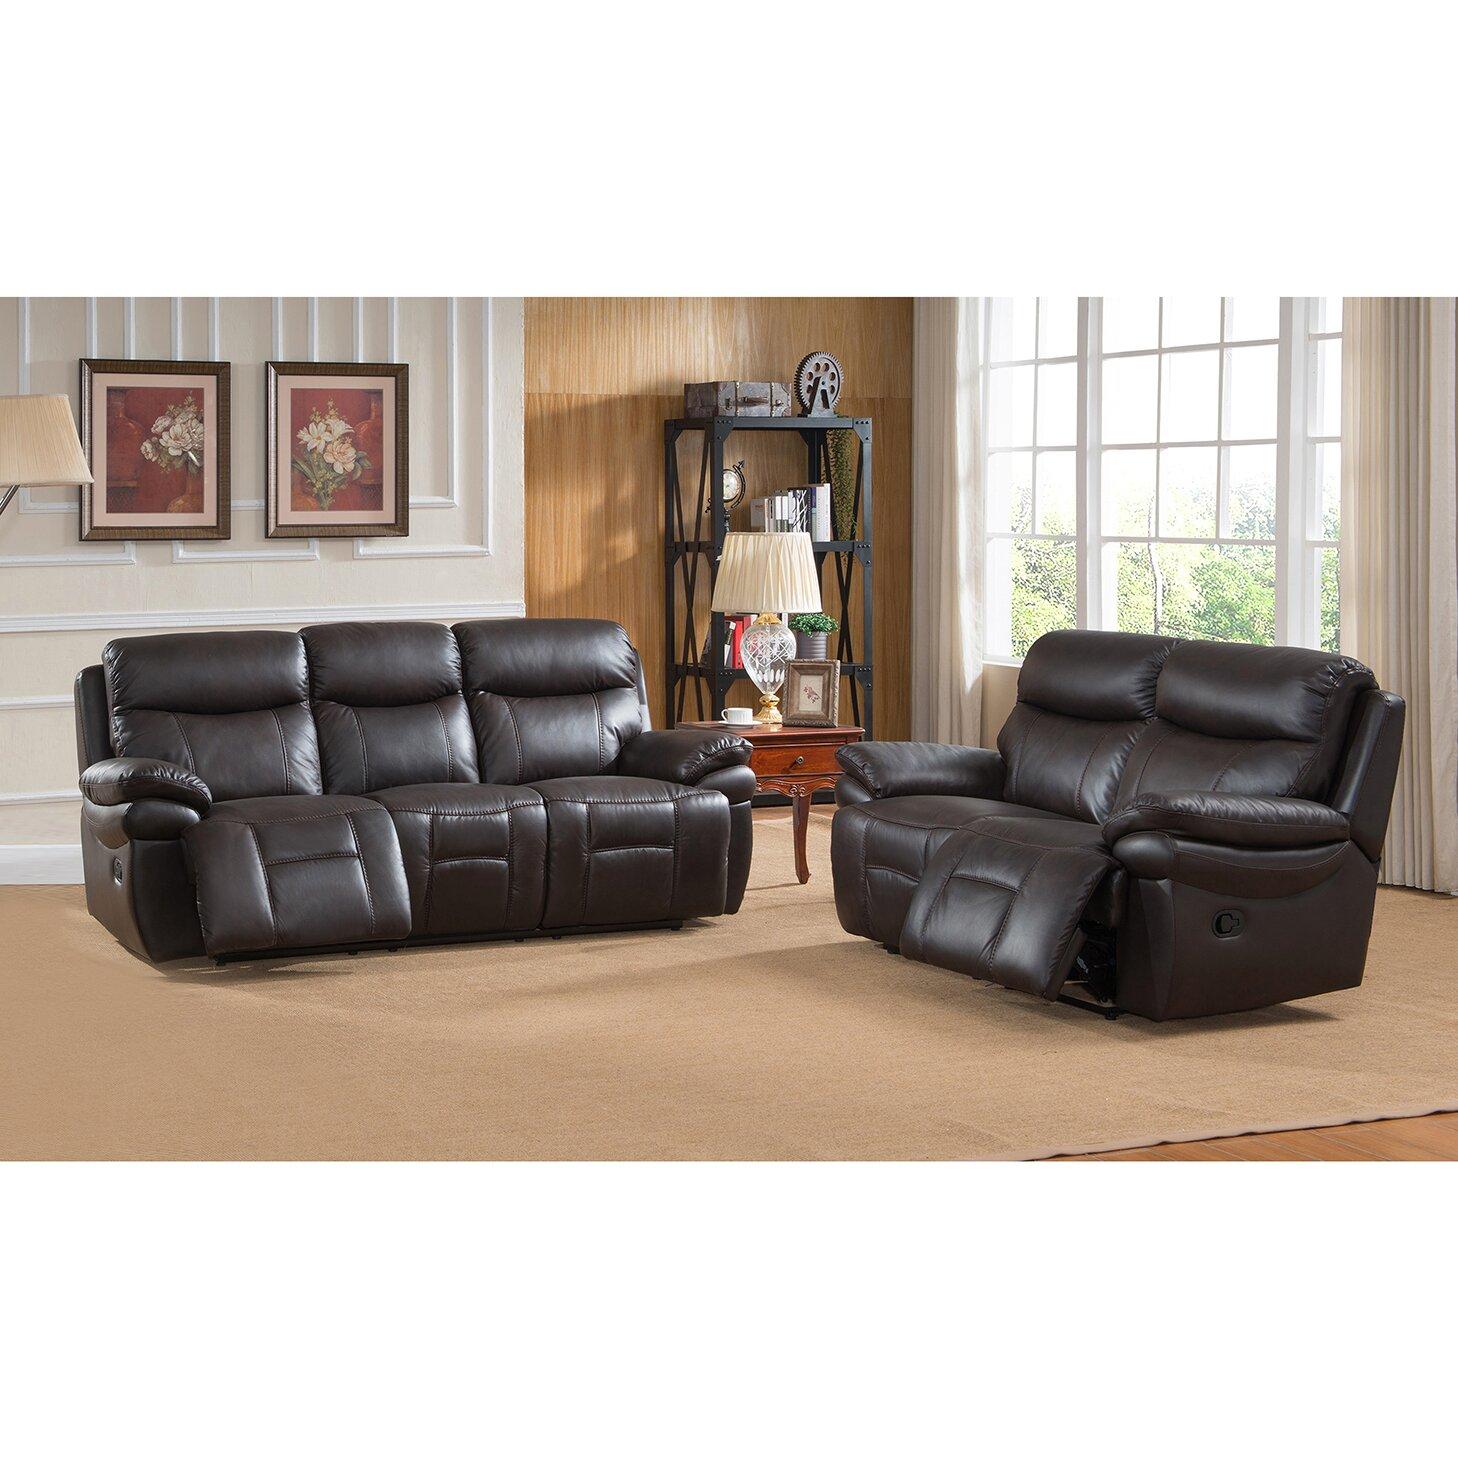 Rushmore Leather Recliner Sofa And Loveseat Set Wayfair